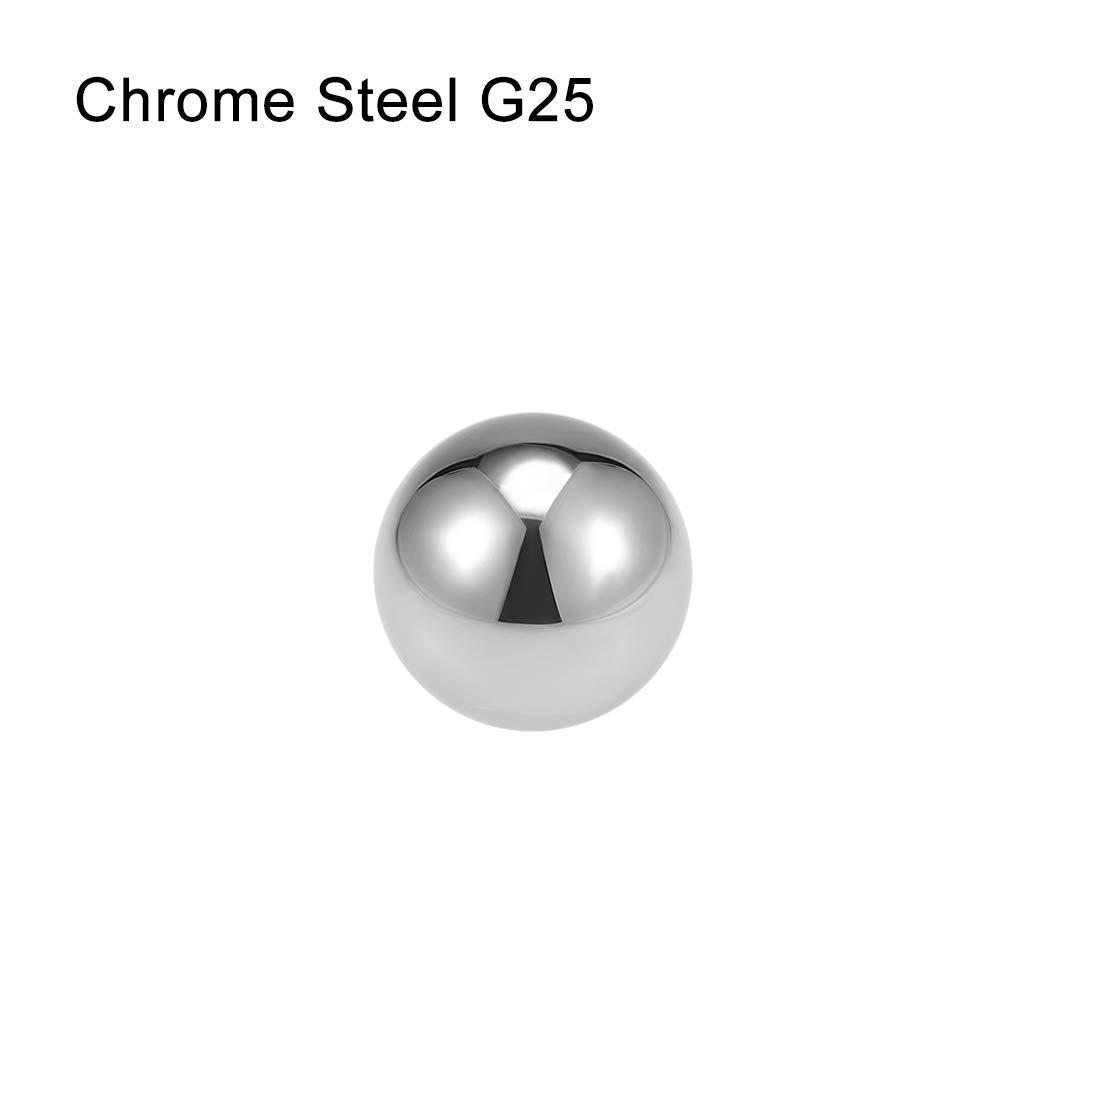 25mm Bearing Balls Chrome Steel G25 Precision 60-63 HRC